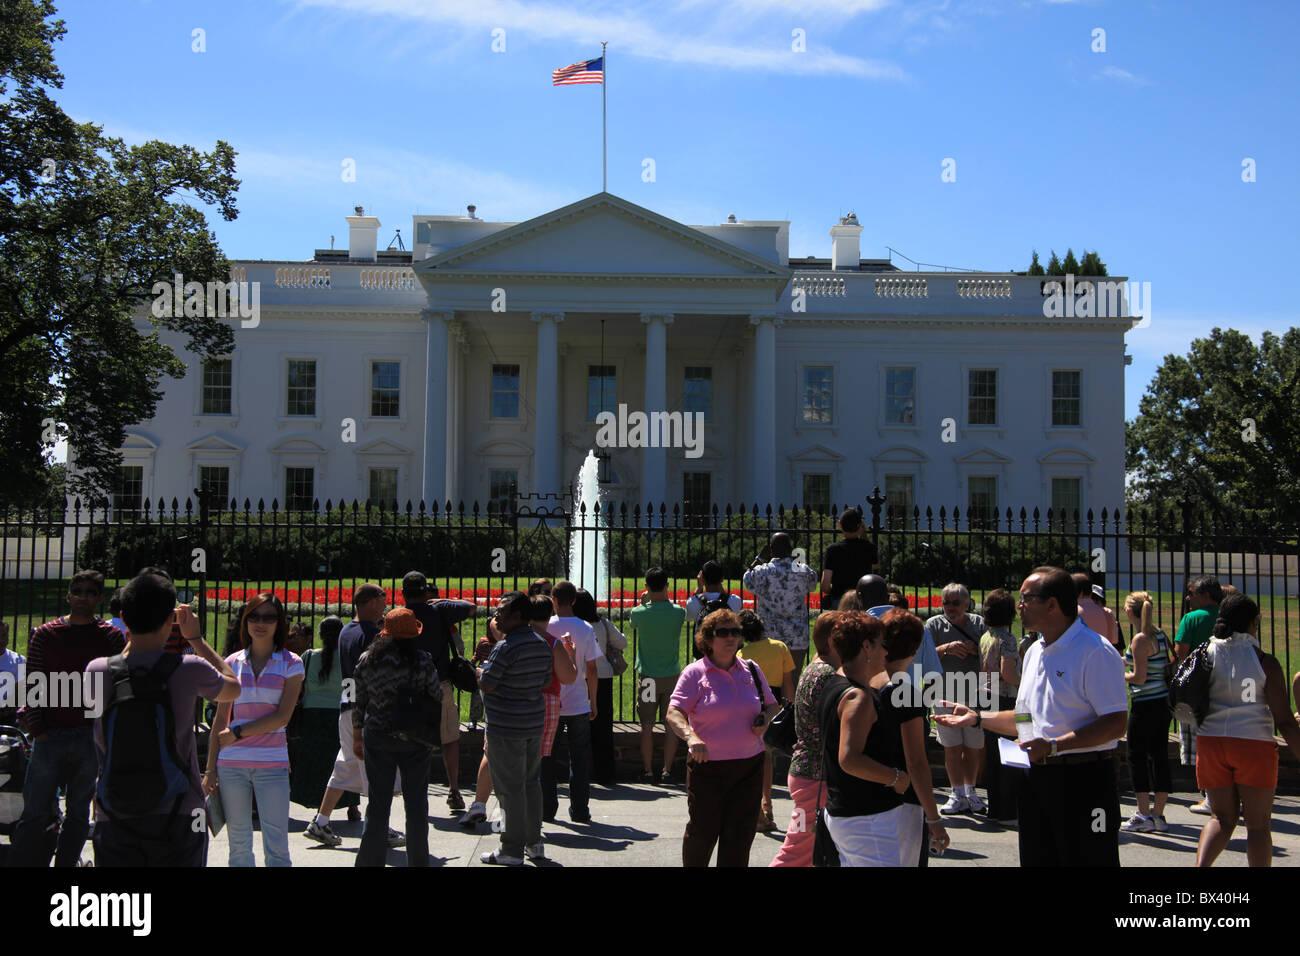 Tourists At The White House 1600 Pennsylvania Avenue Nw Washington D C United States September 5 2010 Stock Photo Alamy